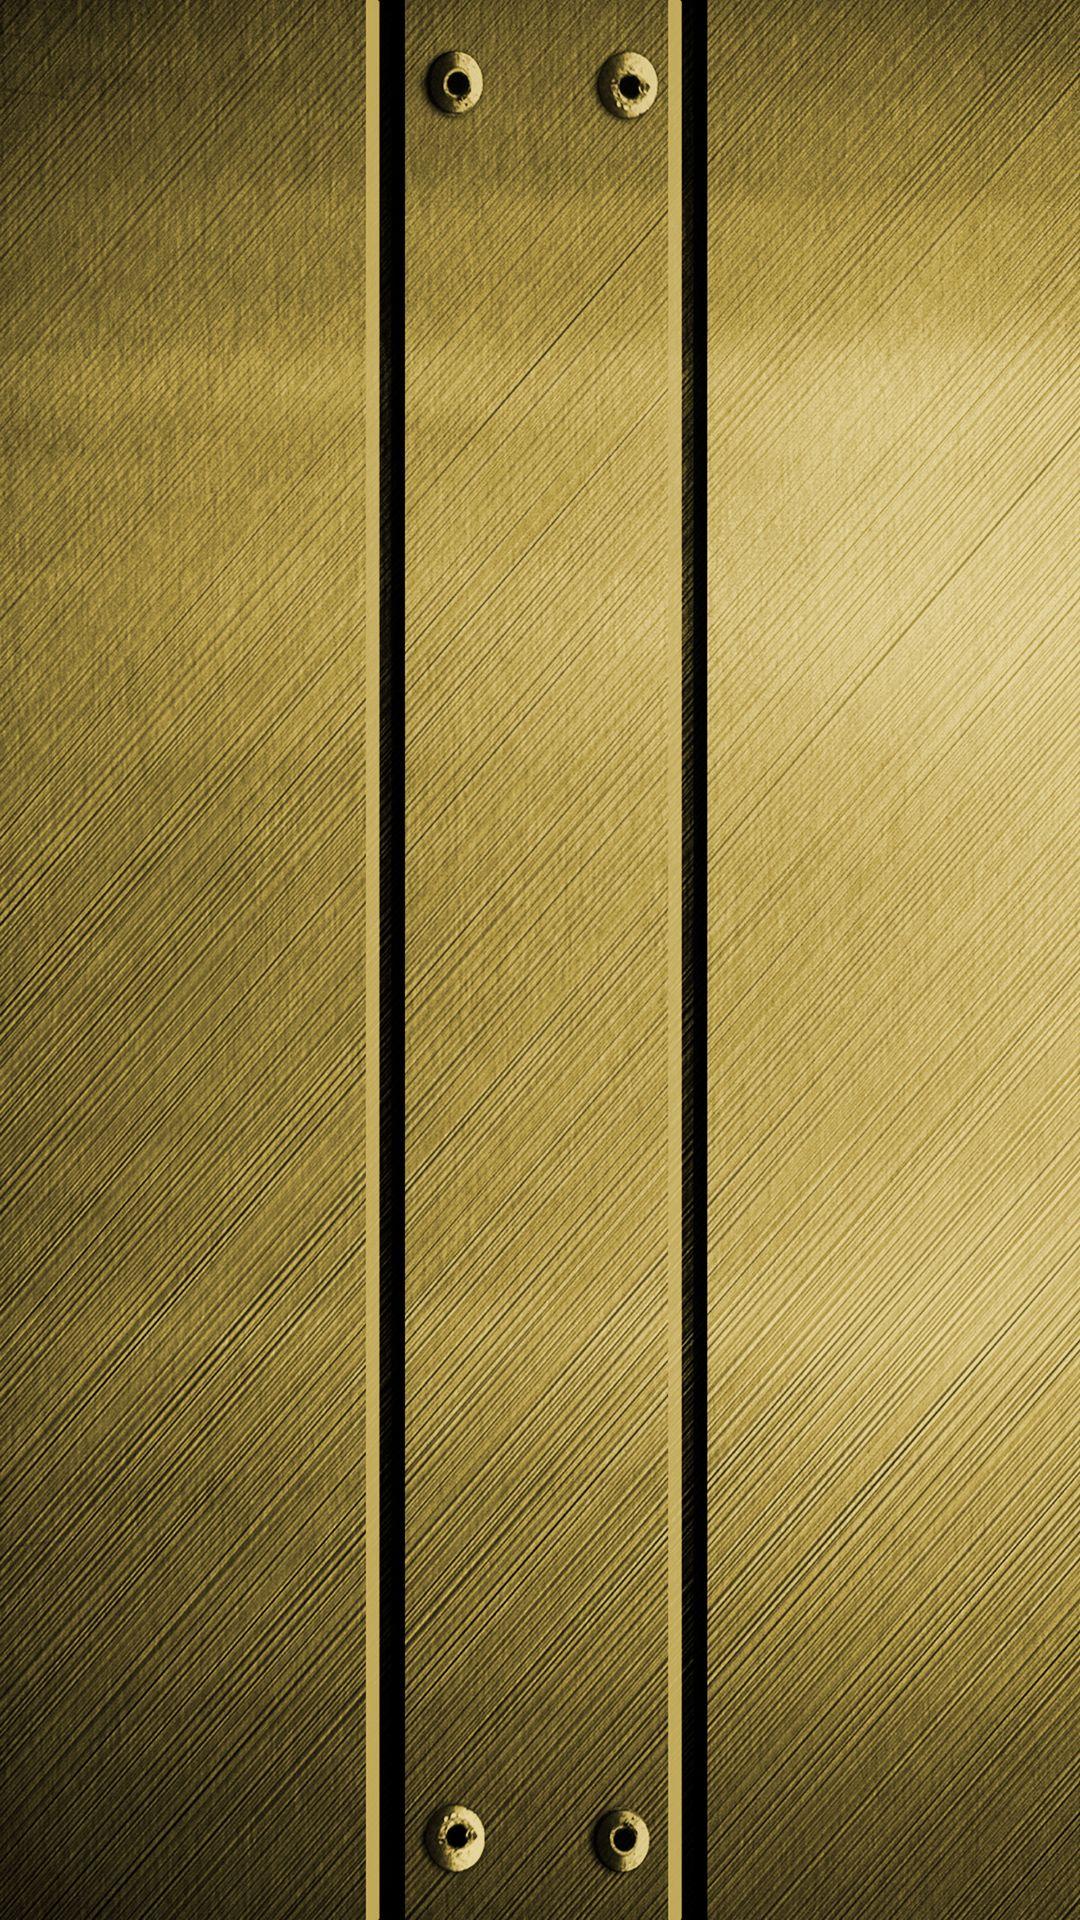 Pin by Lynn Hays on G O L D | Gold wallpaper phone, Gold phone